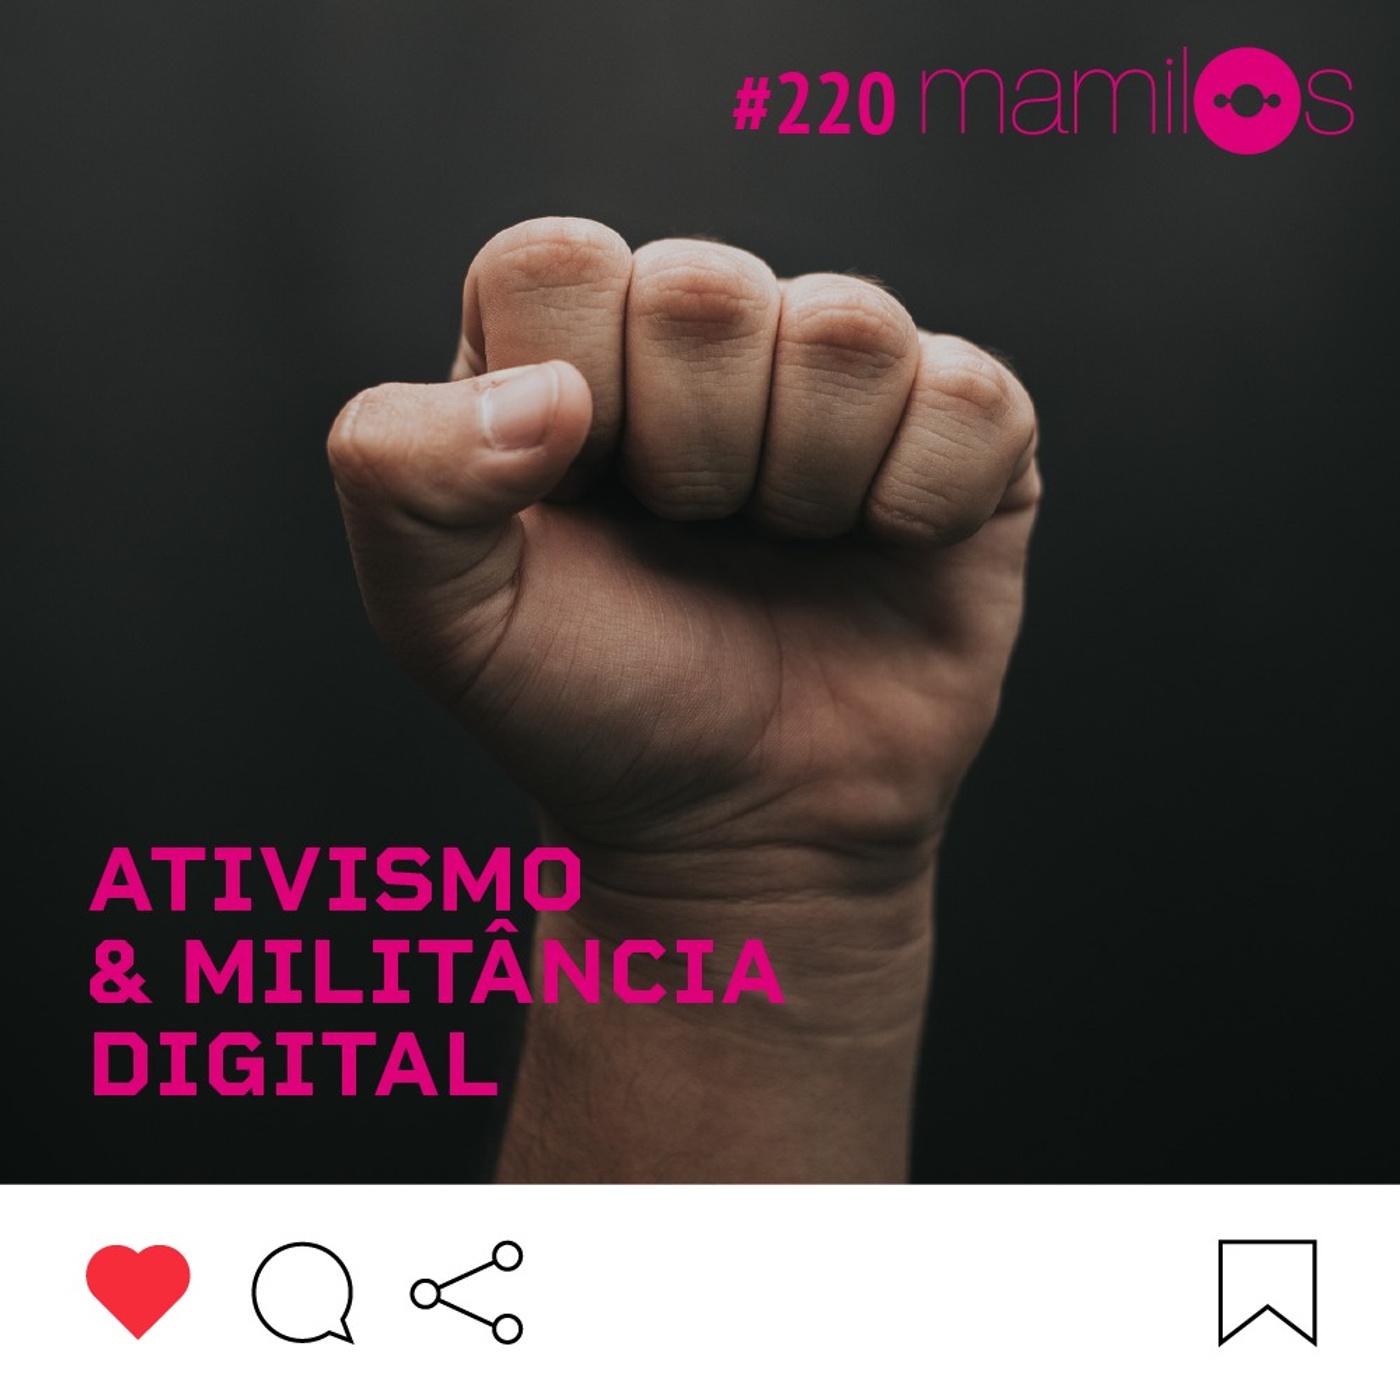 Ativismo & militância digital